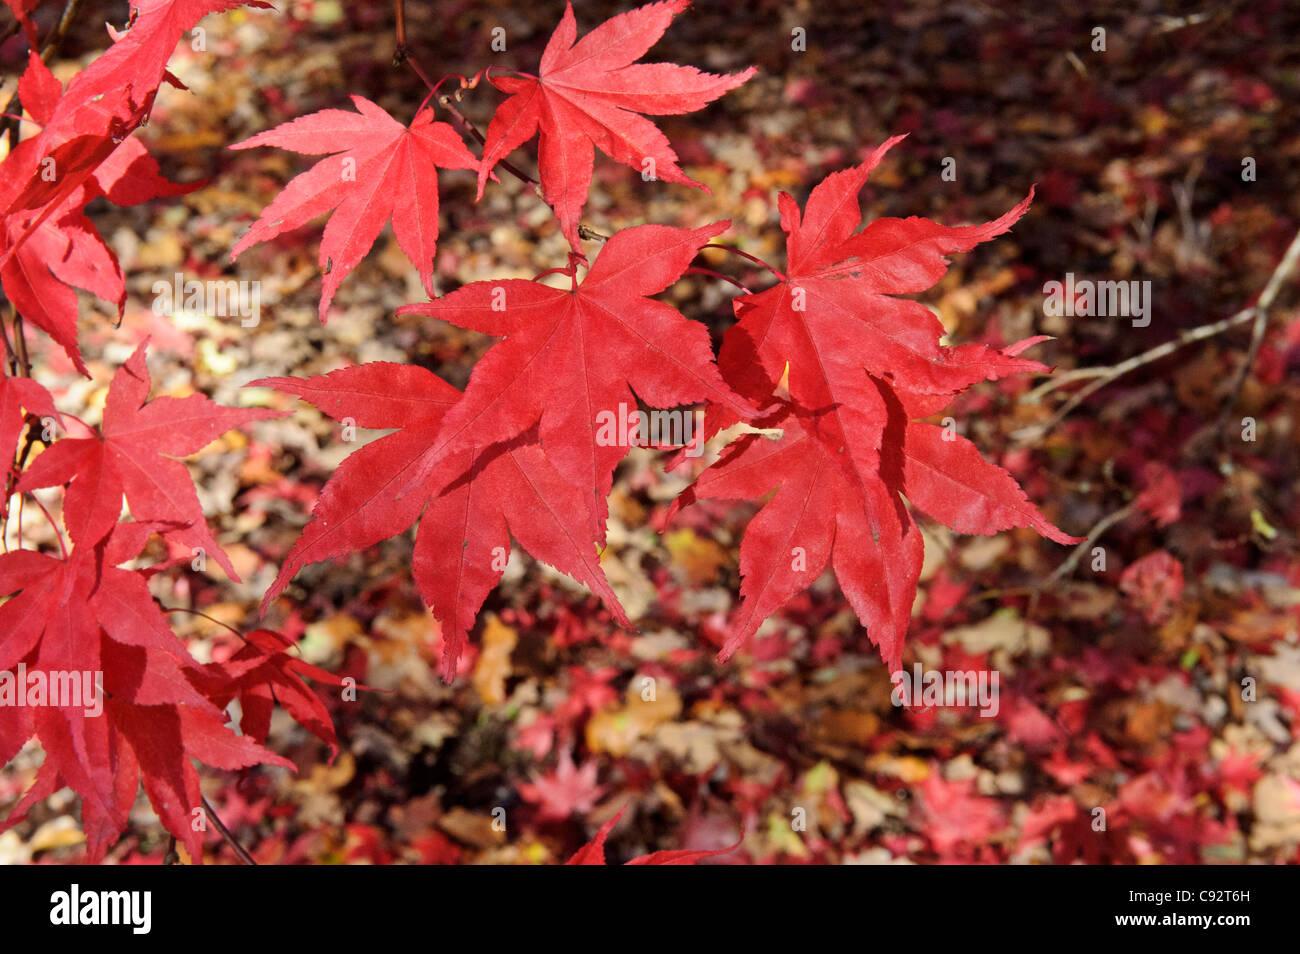 Acer Garden Uk Stock Photos Acer Garden Uk Stock Images Alamy